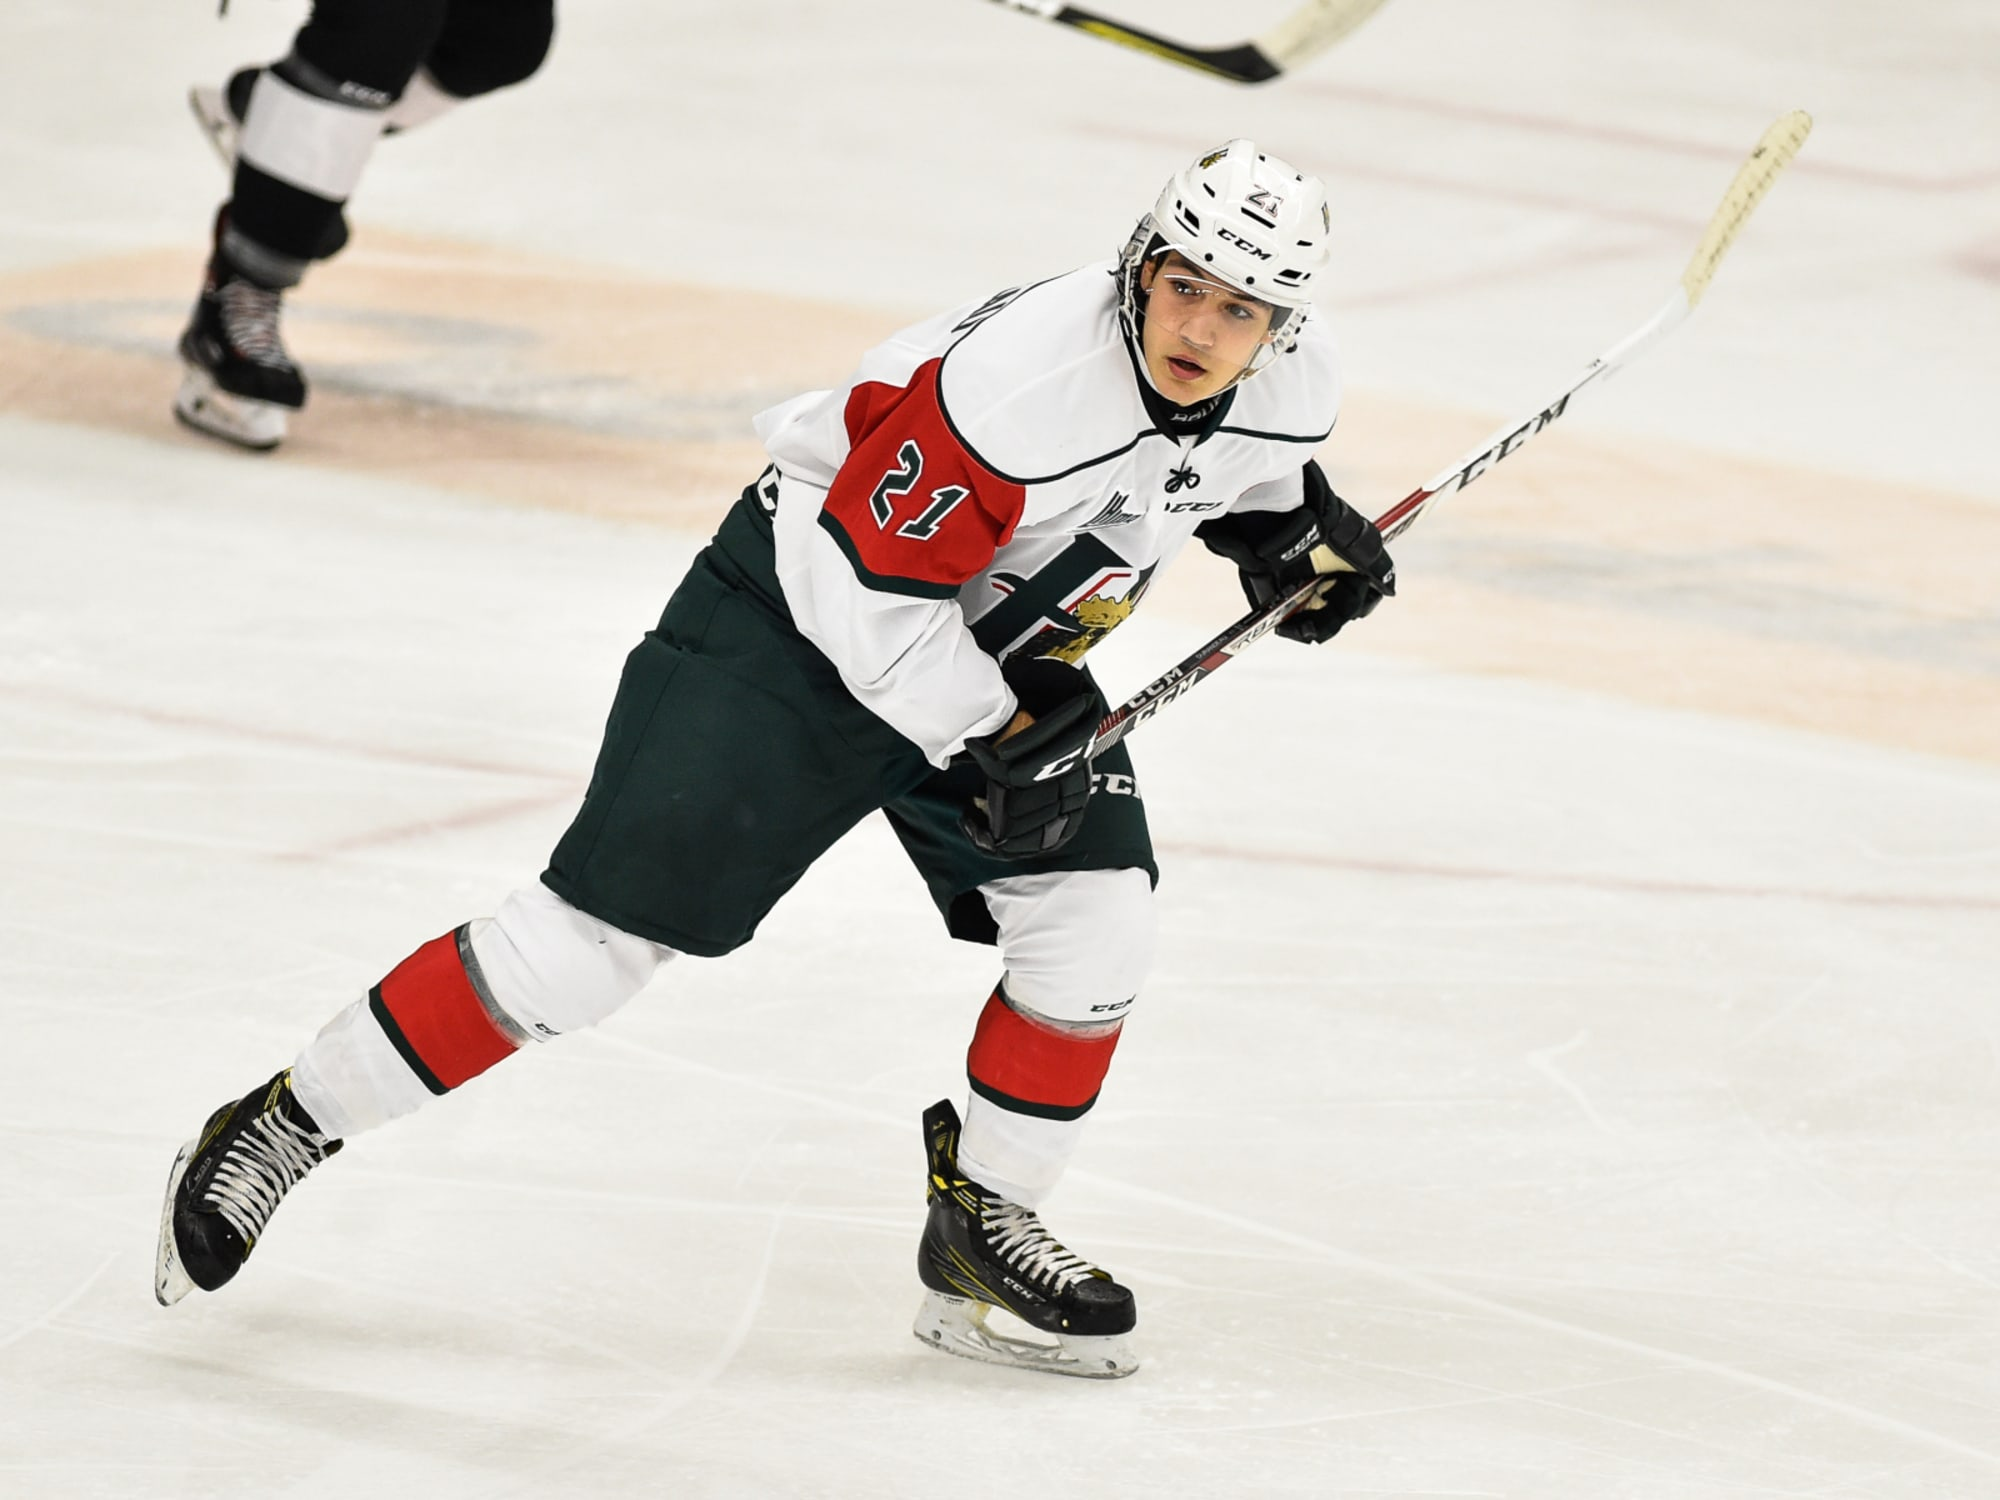 Islanders prospects daily: Arnaud Durandeau's big day/week